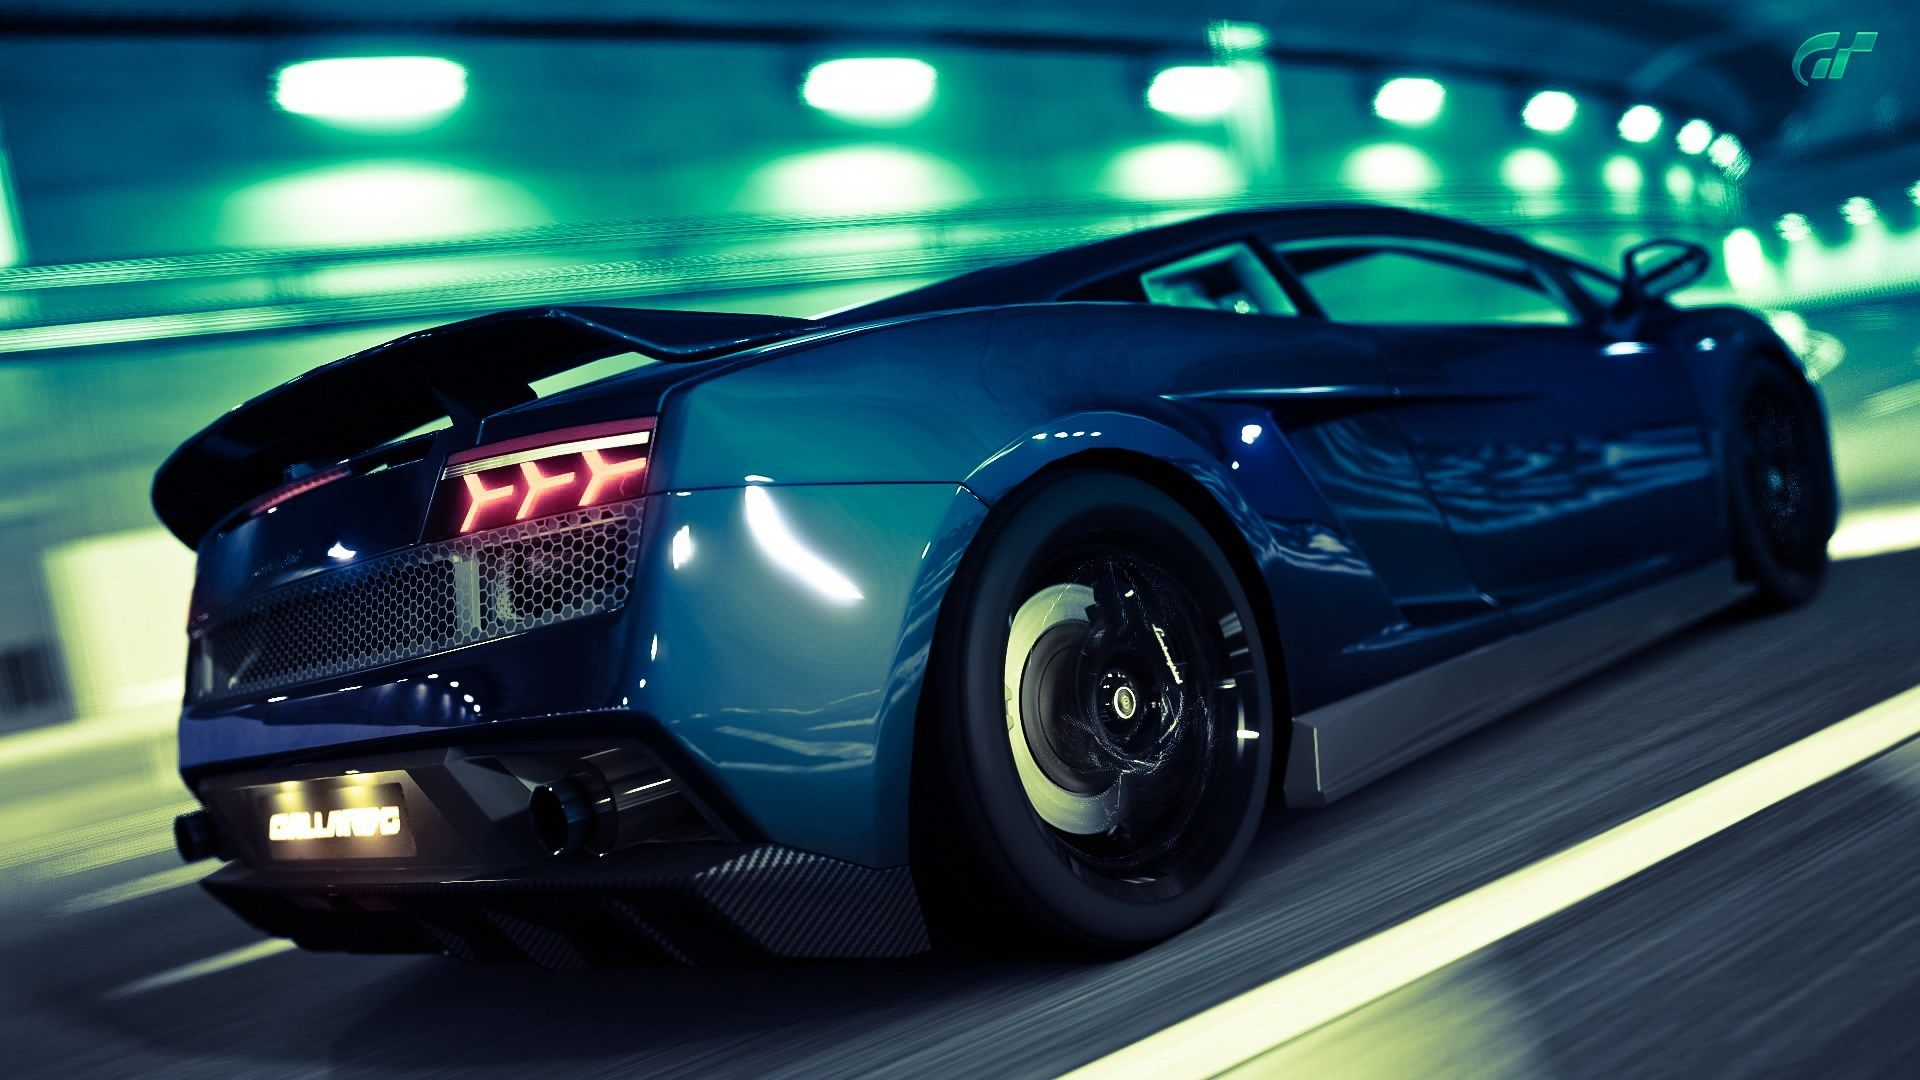 Lamborghini Wallpaper Pack 1080p Hd 1920x1080 286 Kb Blue Lamborghini Lamborghini Gallardo Bugatti Wallpapers